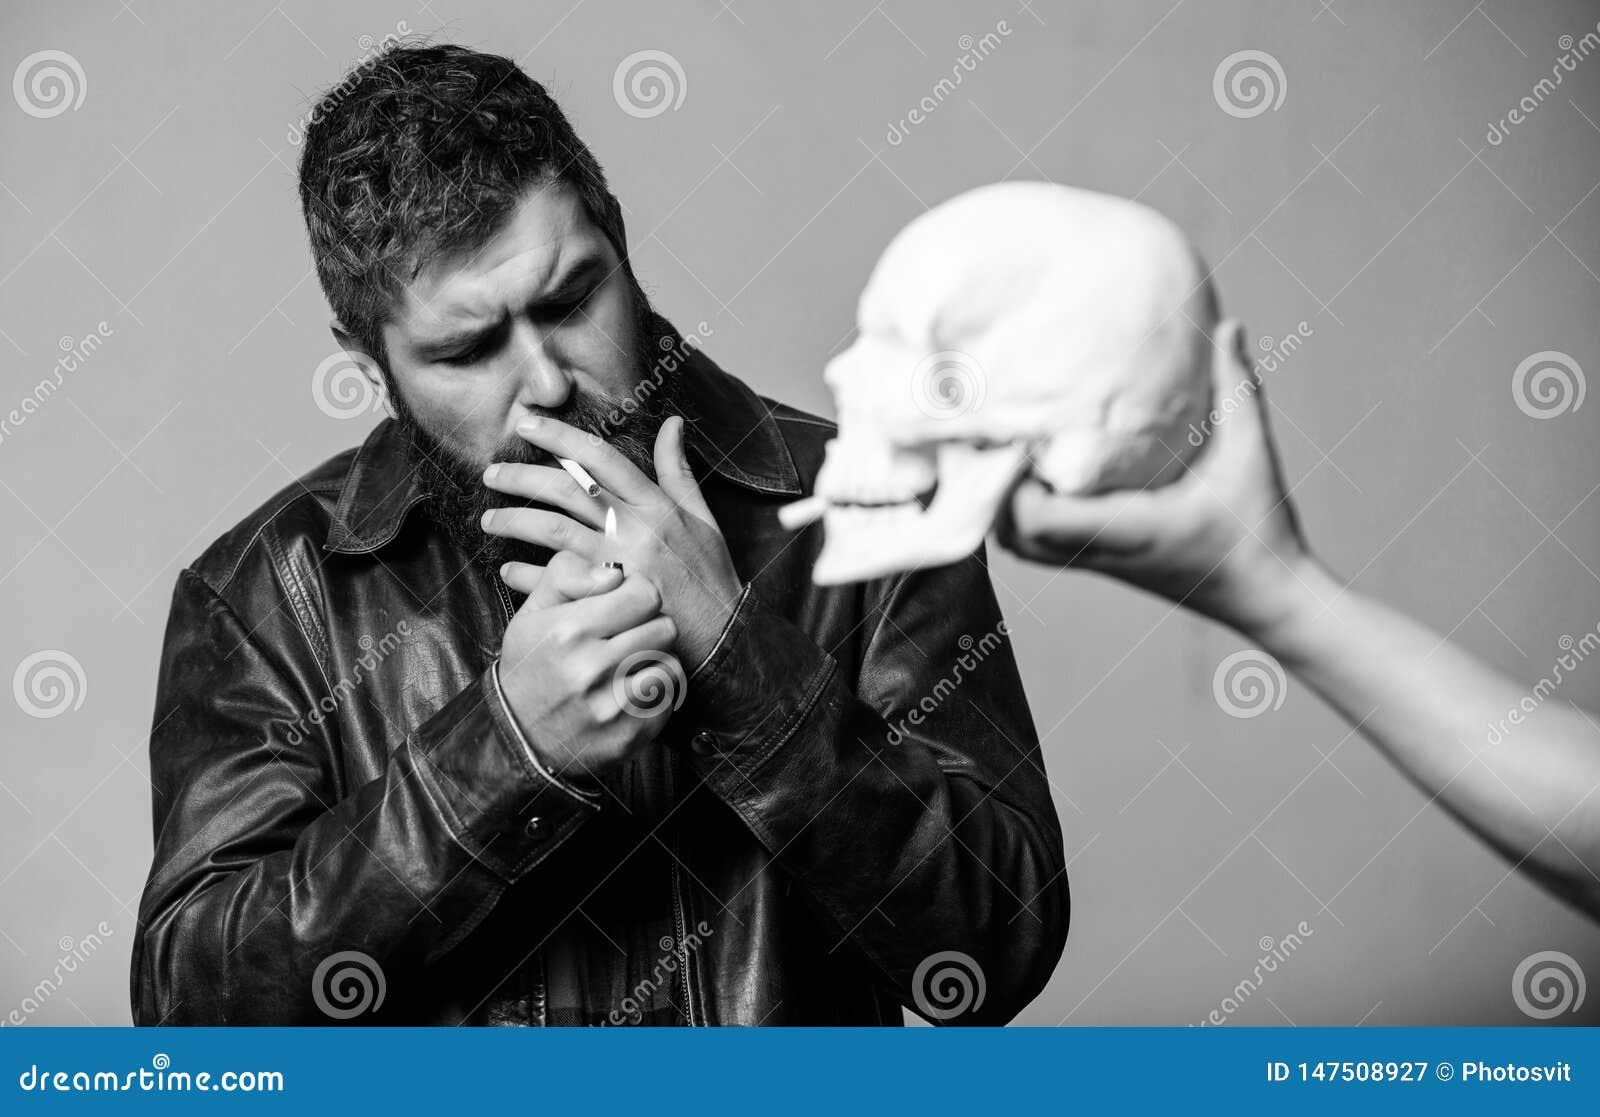 Nicotine destroy health. Harmful habits. Smoking is harmful. Habit to smoke tobacco bring harm to your body. Smoking